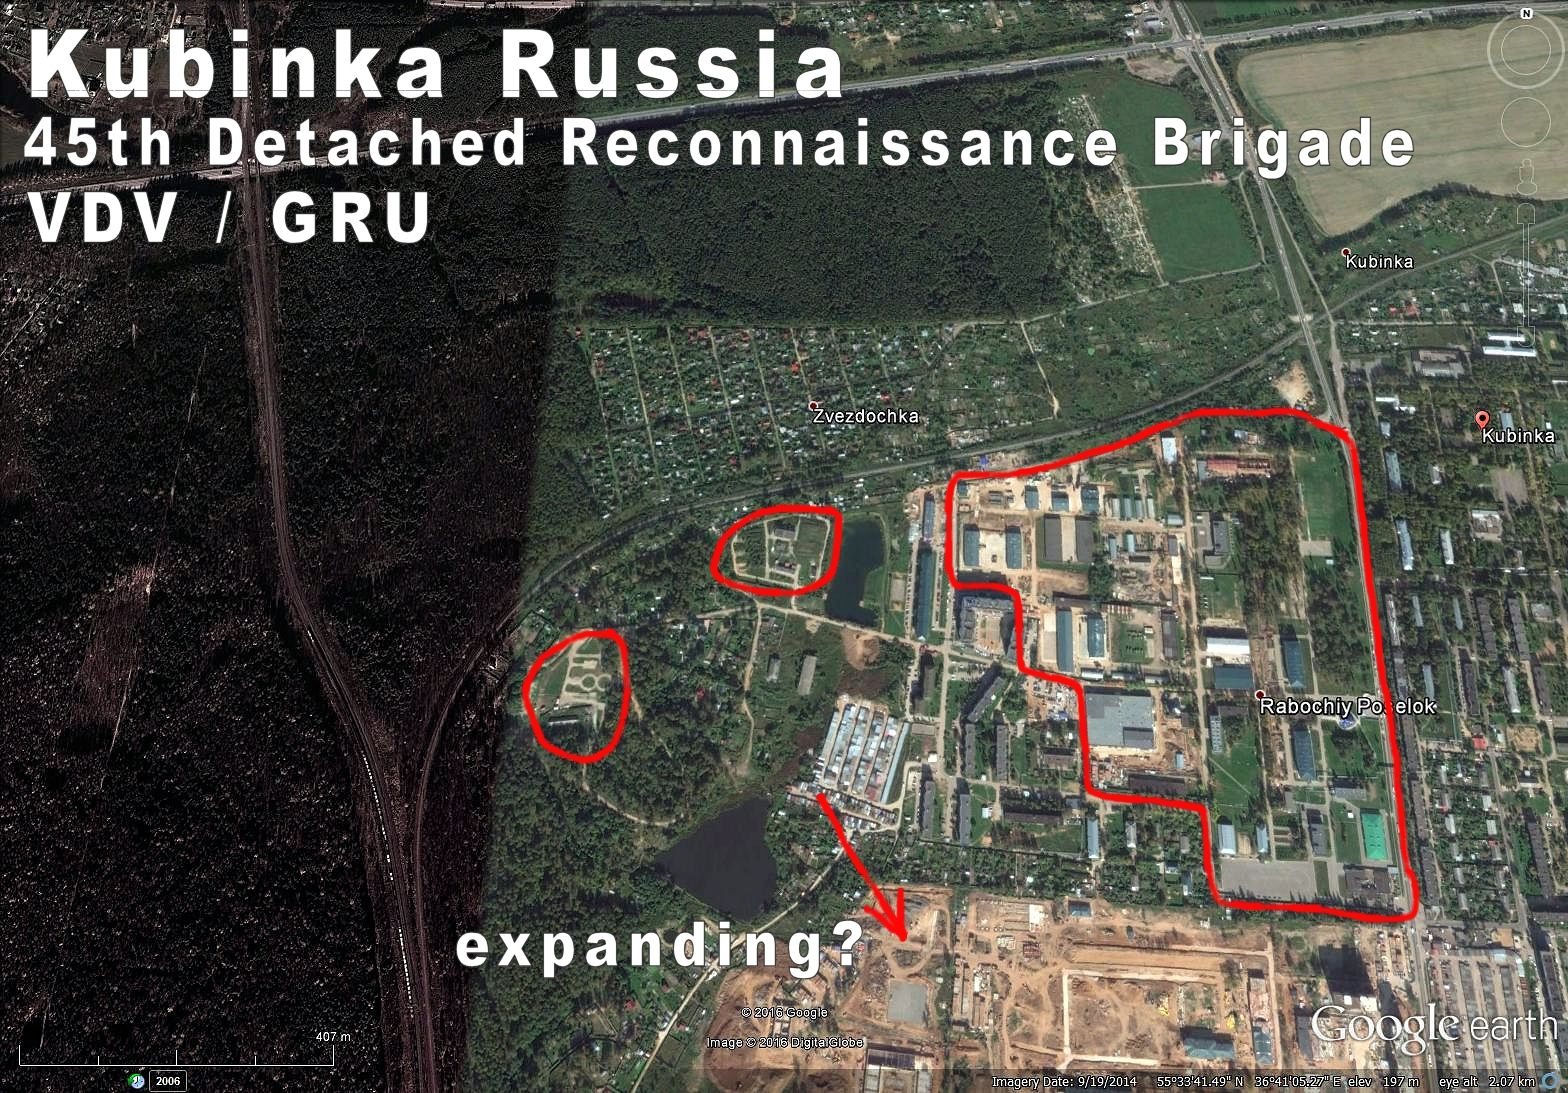 Kubinka Moscow Russia 45th VDVGRU Brigade Kubinka